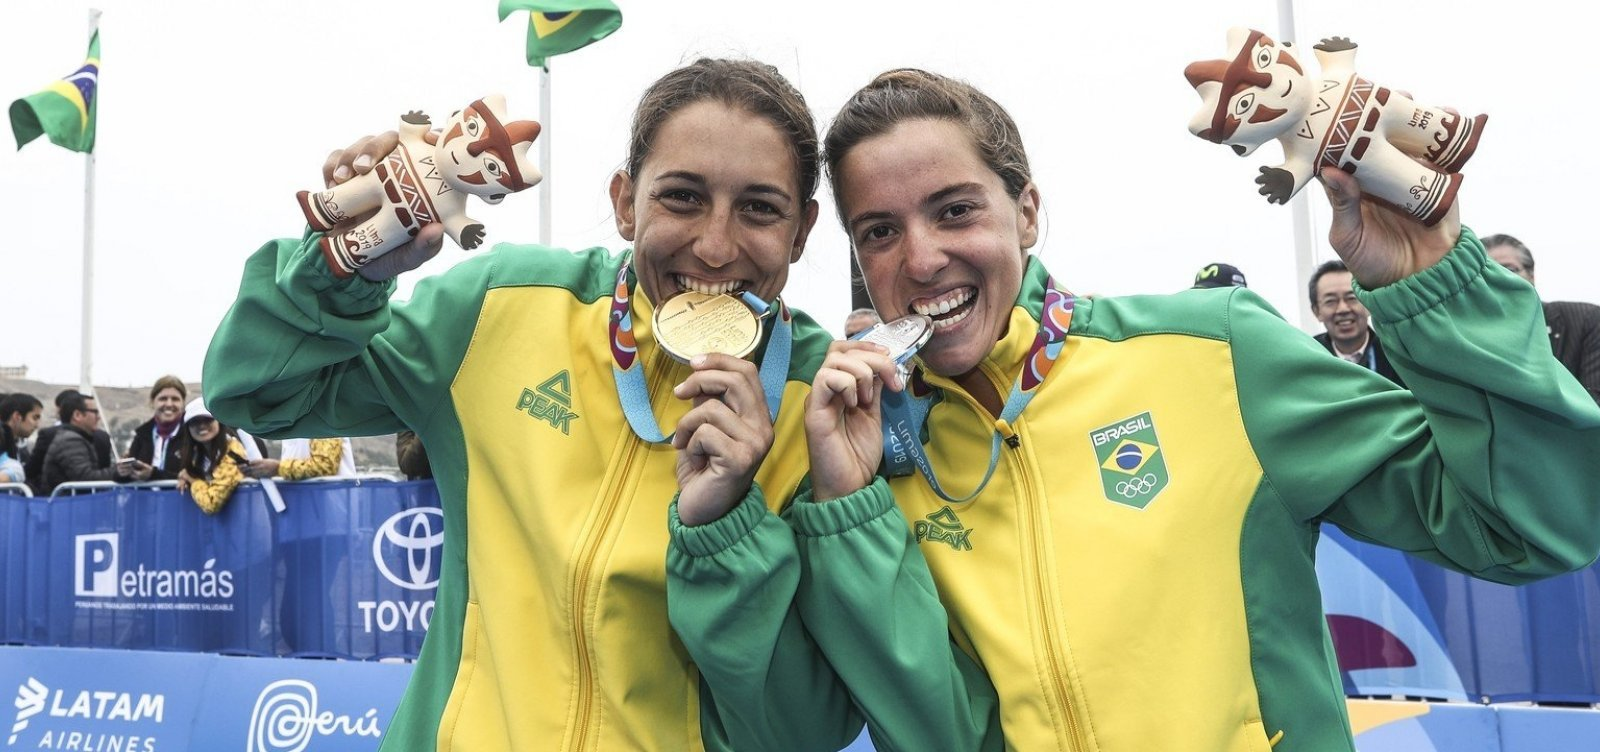 [Brasil bate recorde de medalhas nos Jogos Pan-americanos]